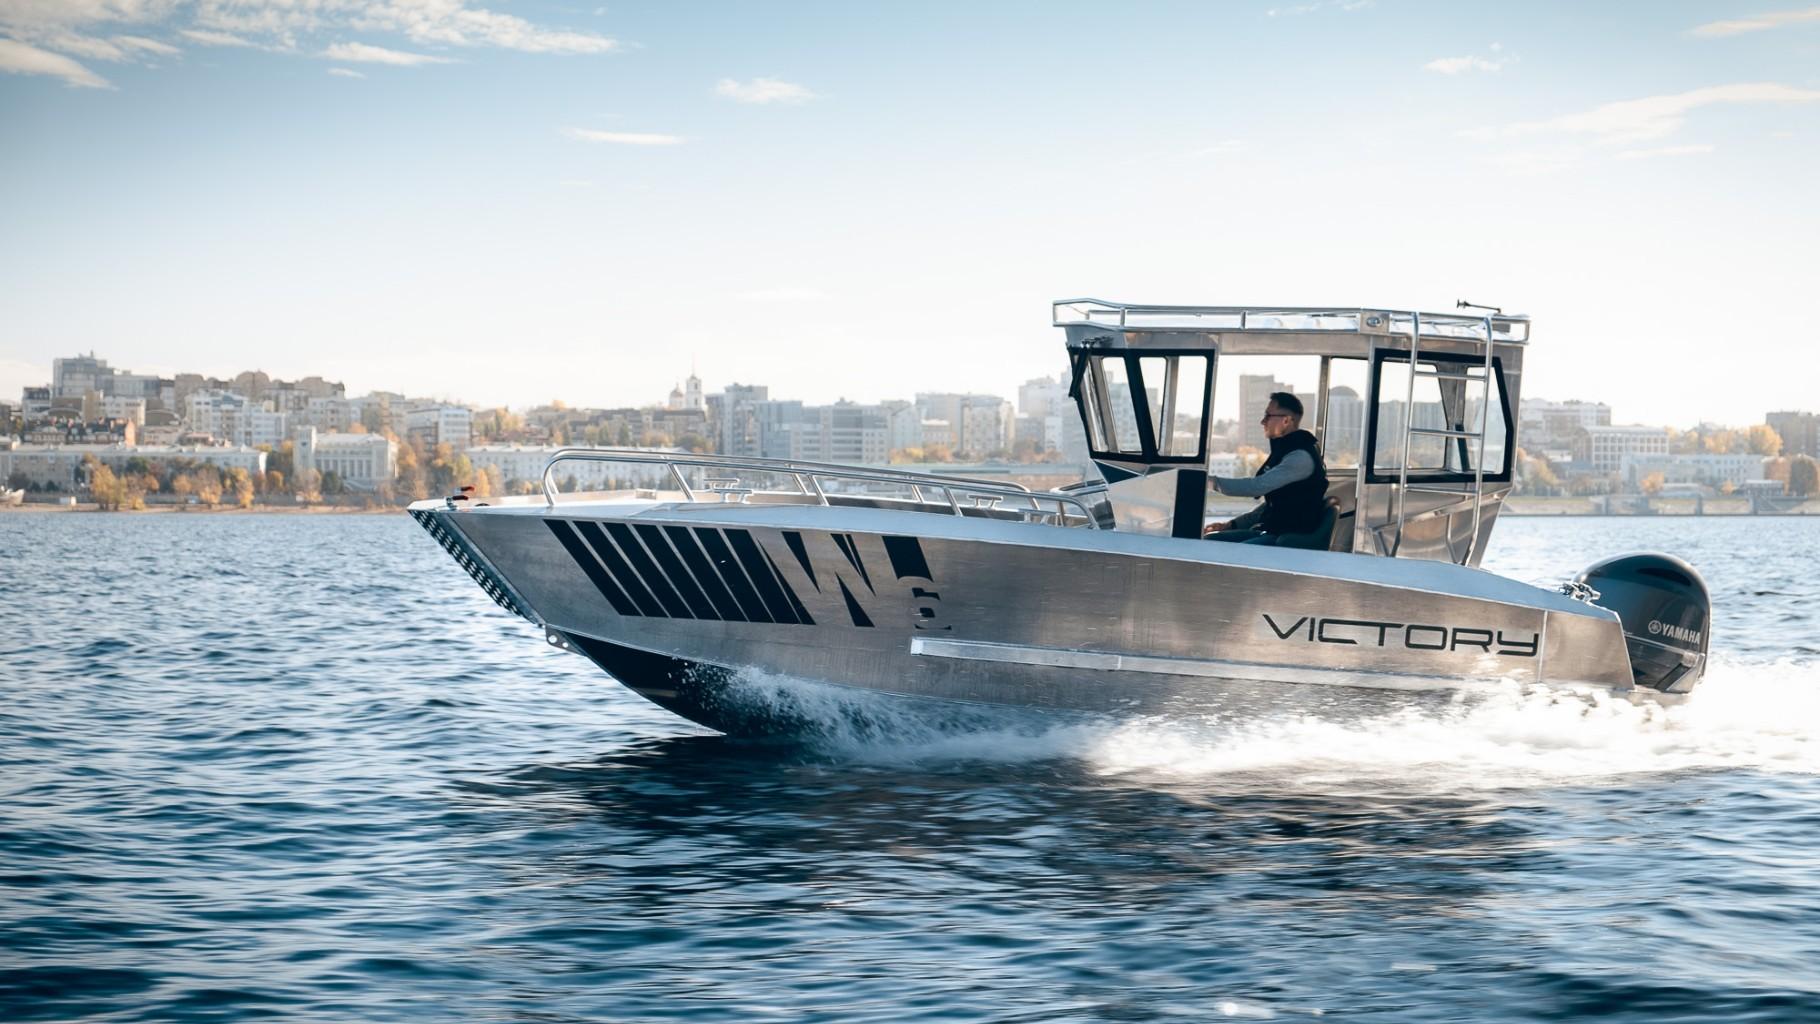 landing-craft-victory-w6